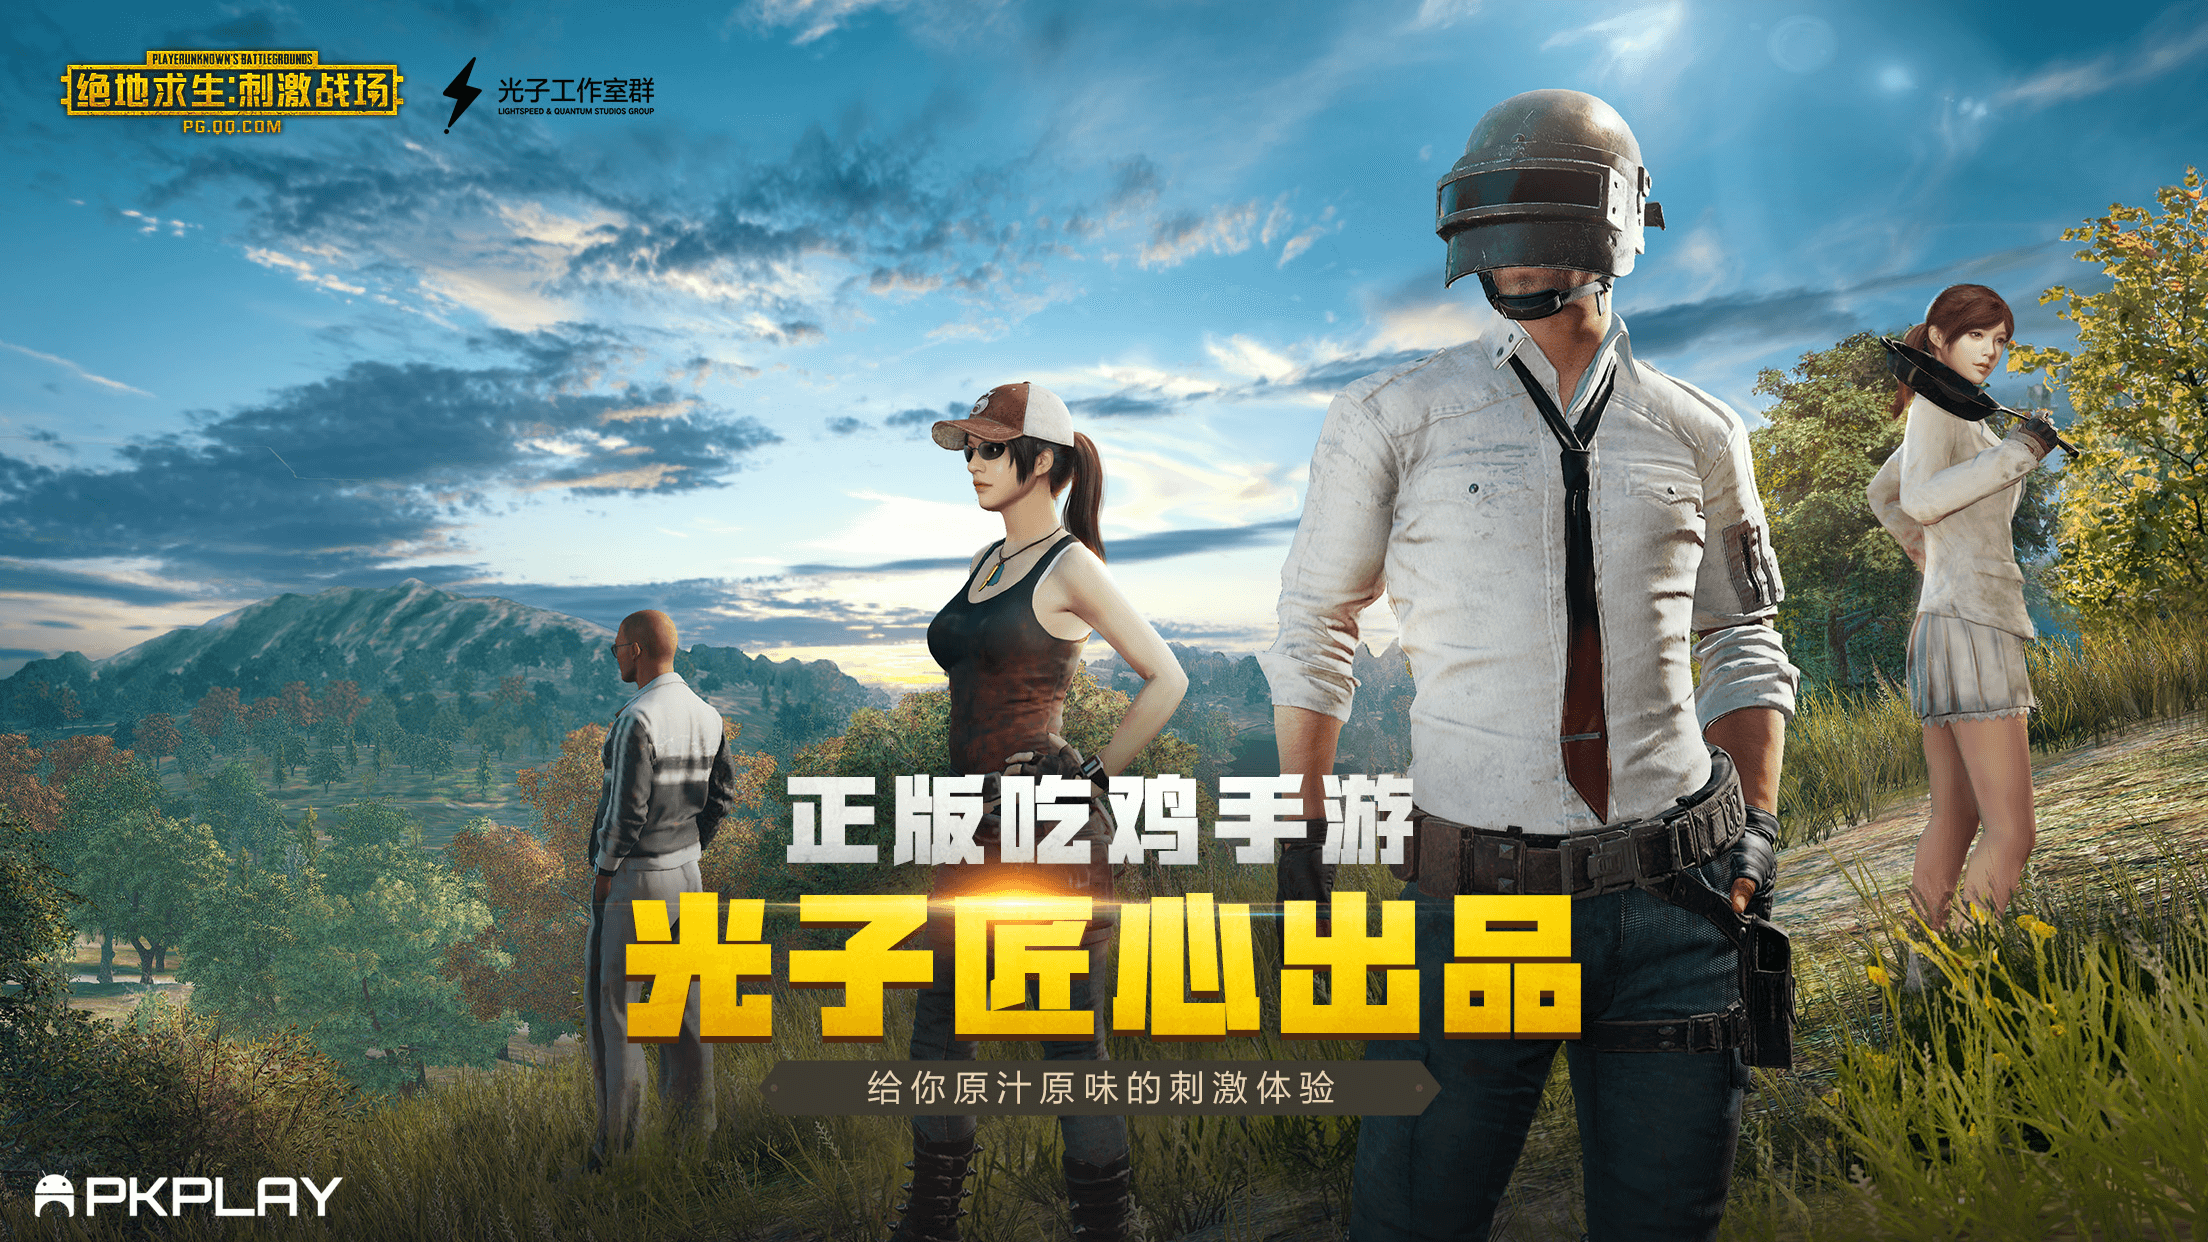 تحميل ببجي الصينية PUBG Mobile Chinese للاندرويد | أبك بلاي